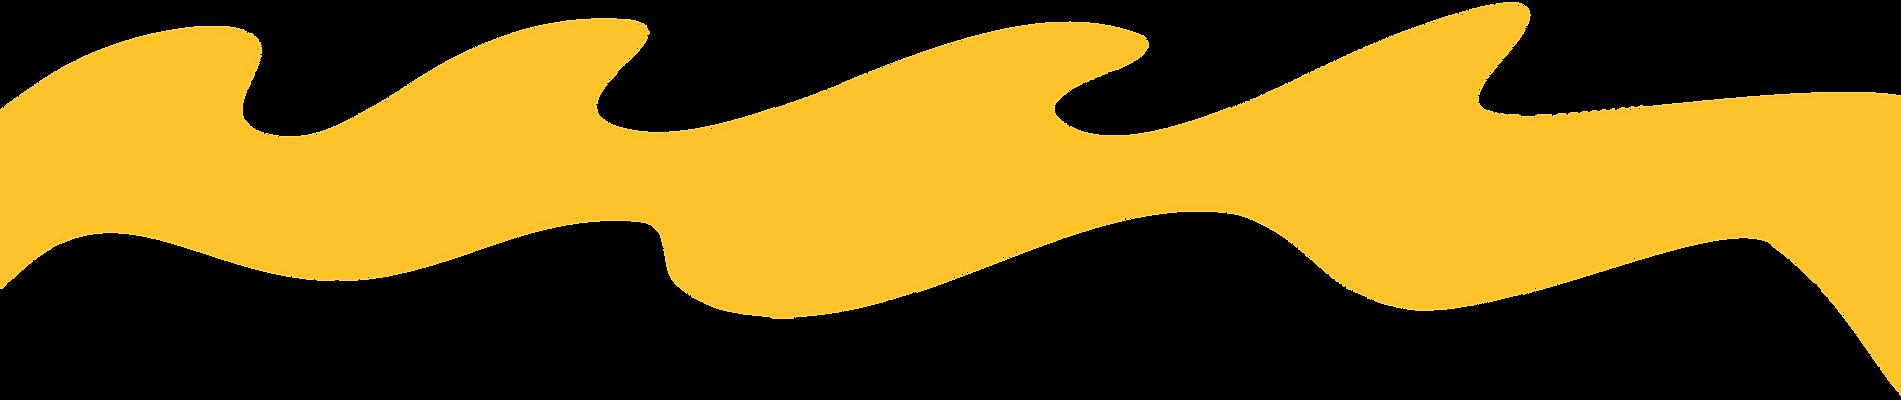 waves-amarelo.png